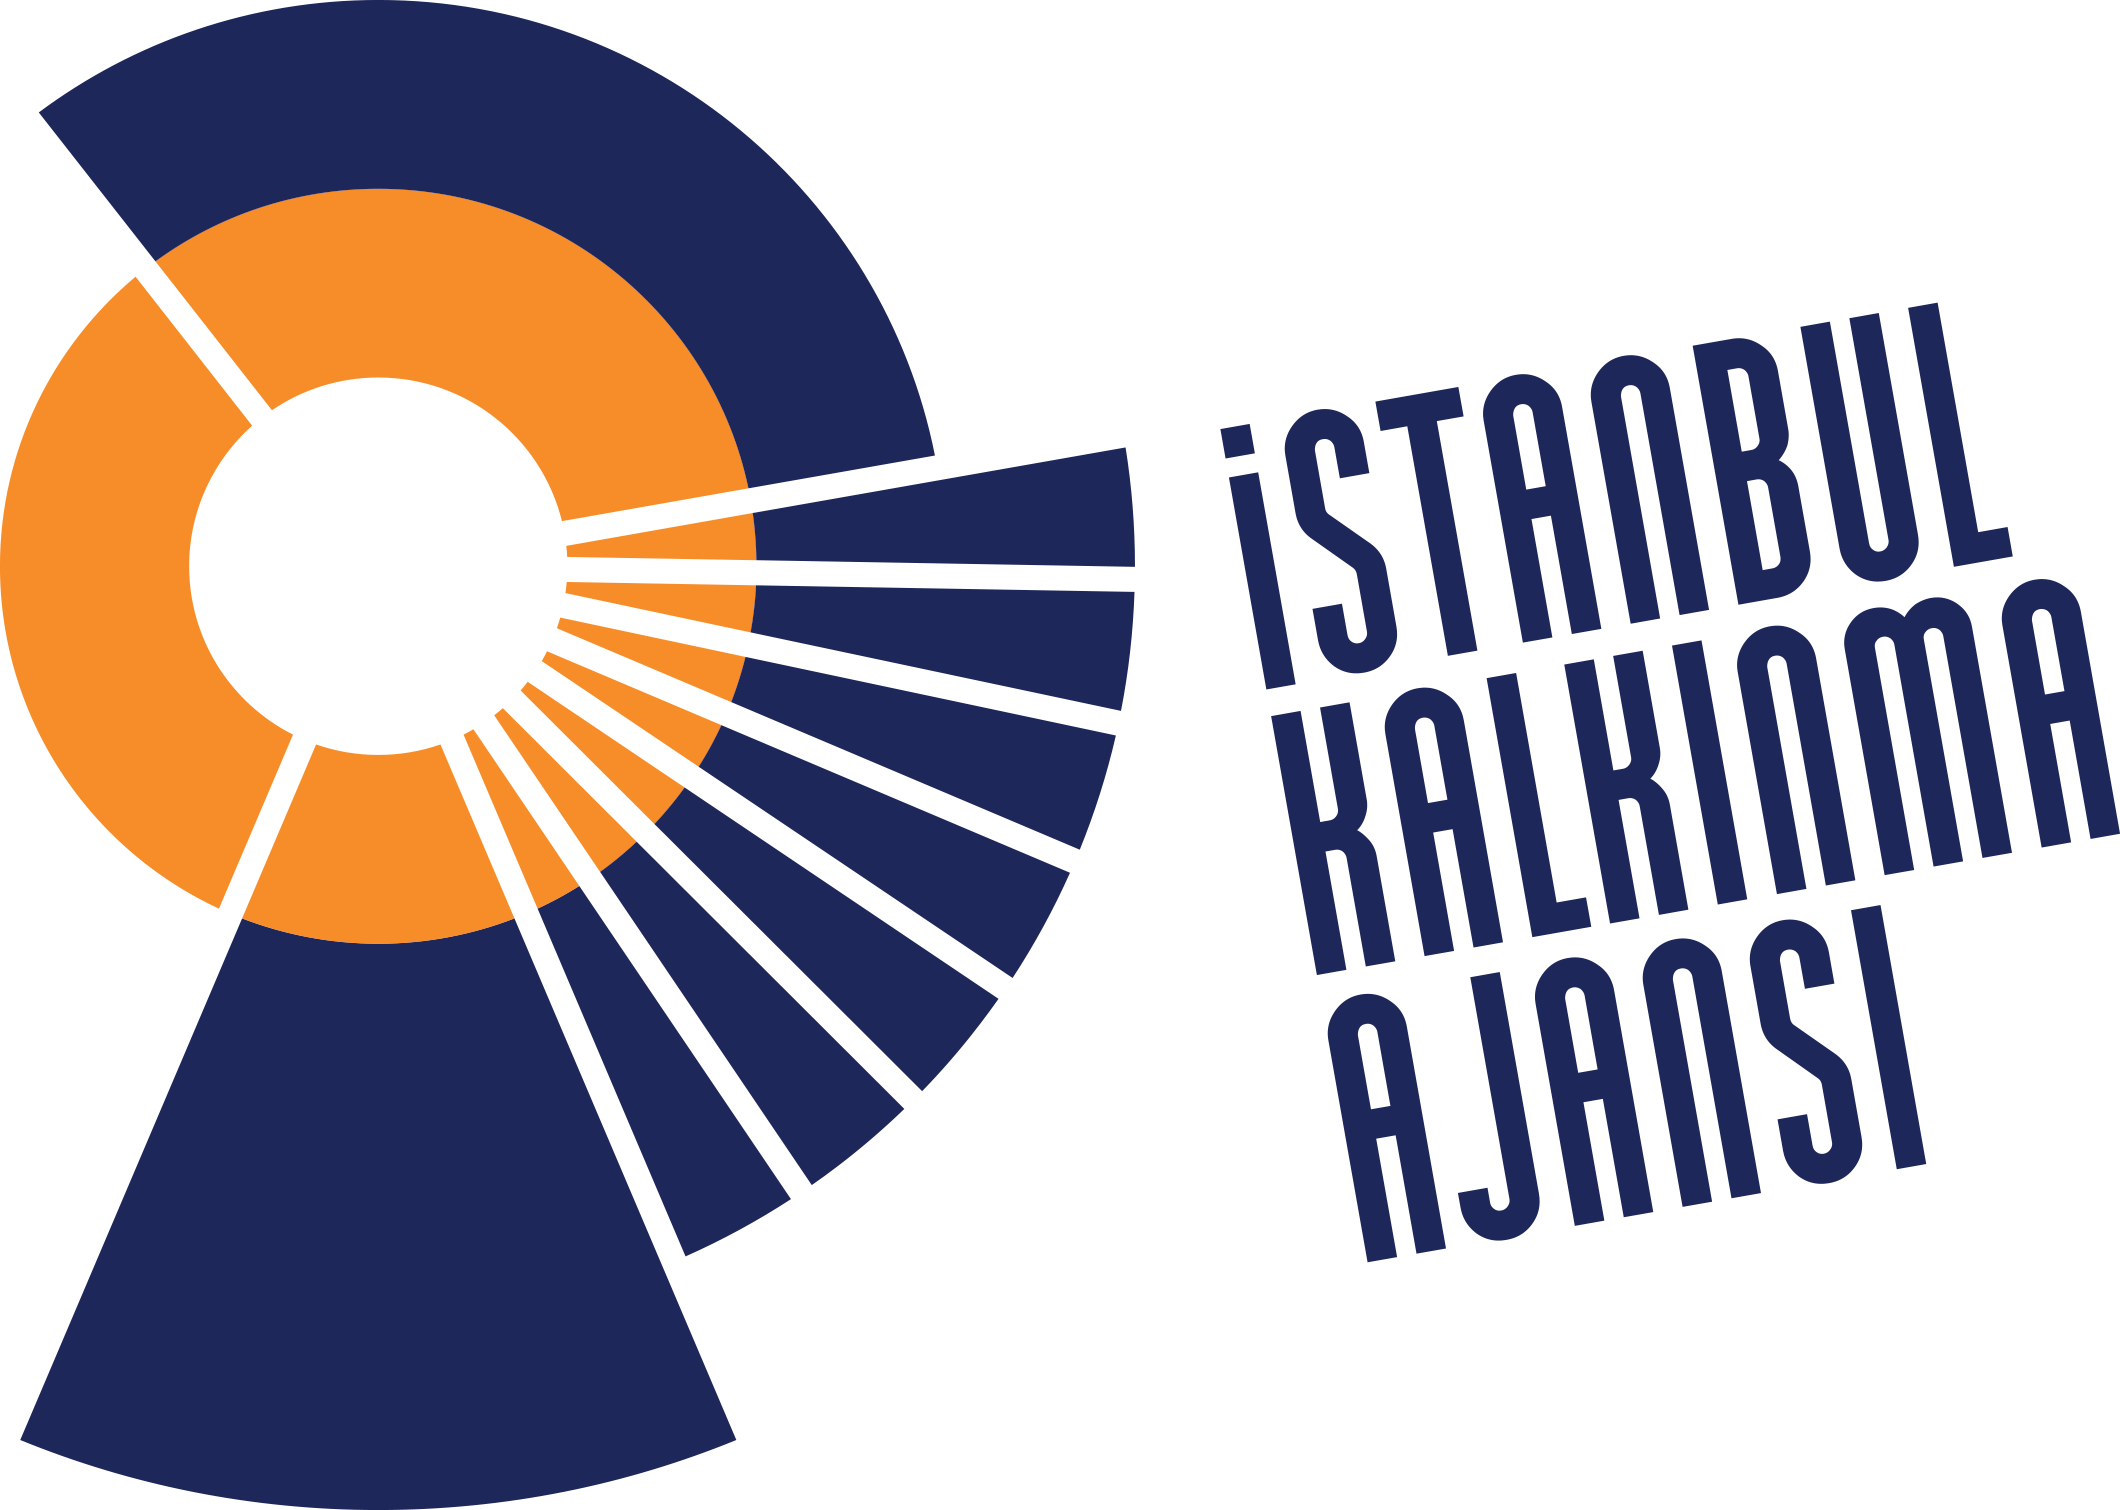 IstanbulKalkinmaAjansiTR